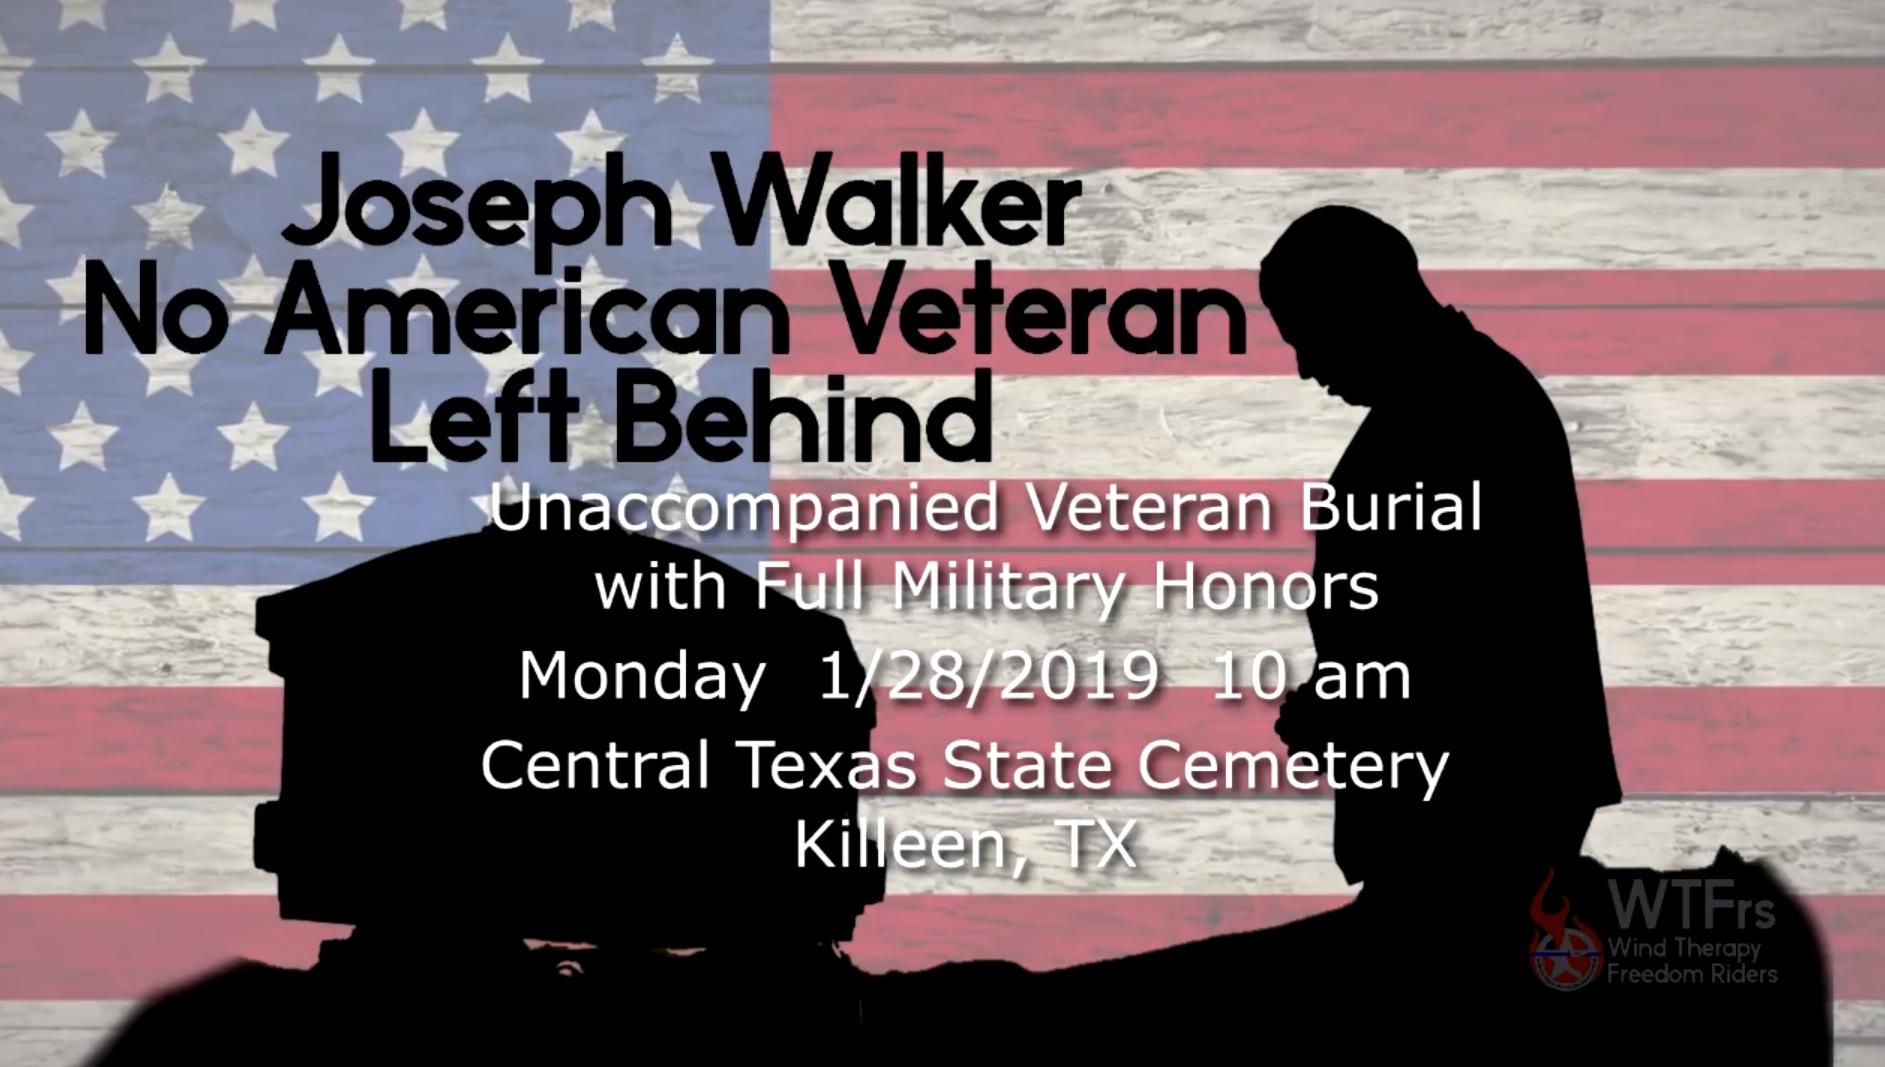 Seruan kepada publik untuk menghadiri pemakaman bagi veteran tanpa pendamping membuat pengendara motor yang penuh keyakinan di jalan